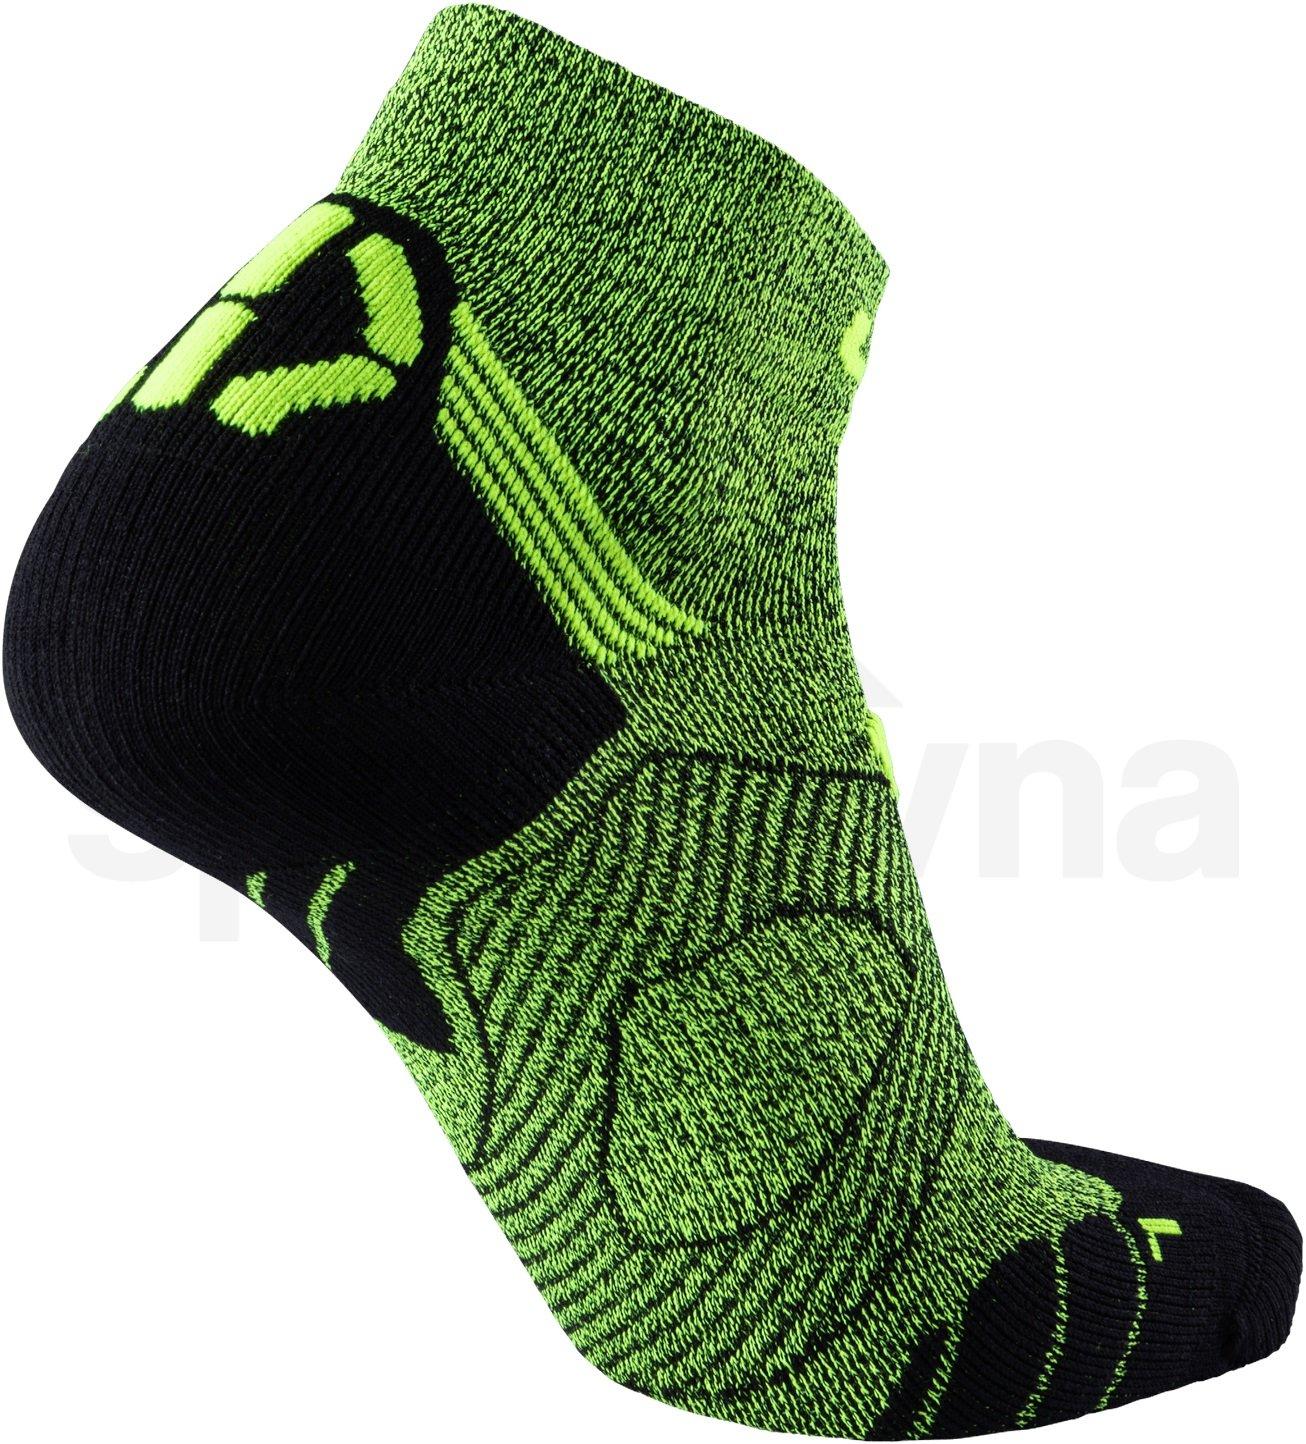 Ponožky UYN RUN SUPER FAST - žlutá/černá